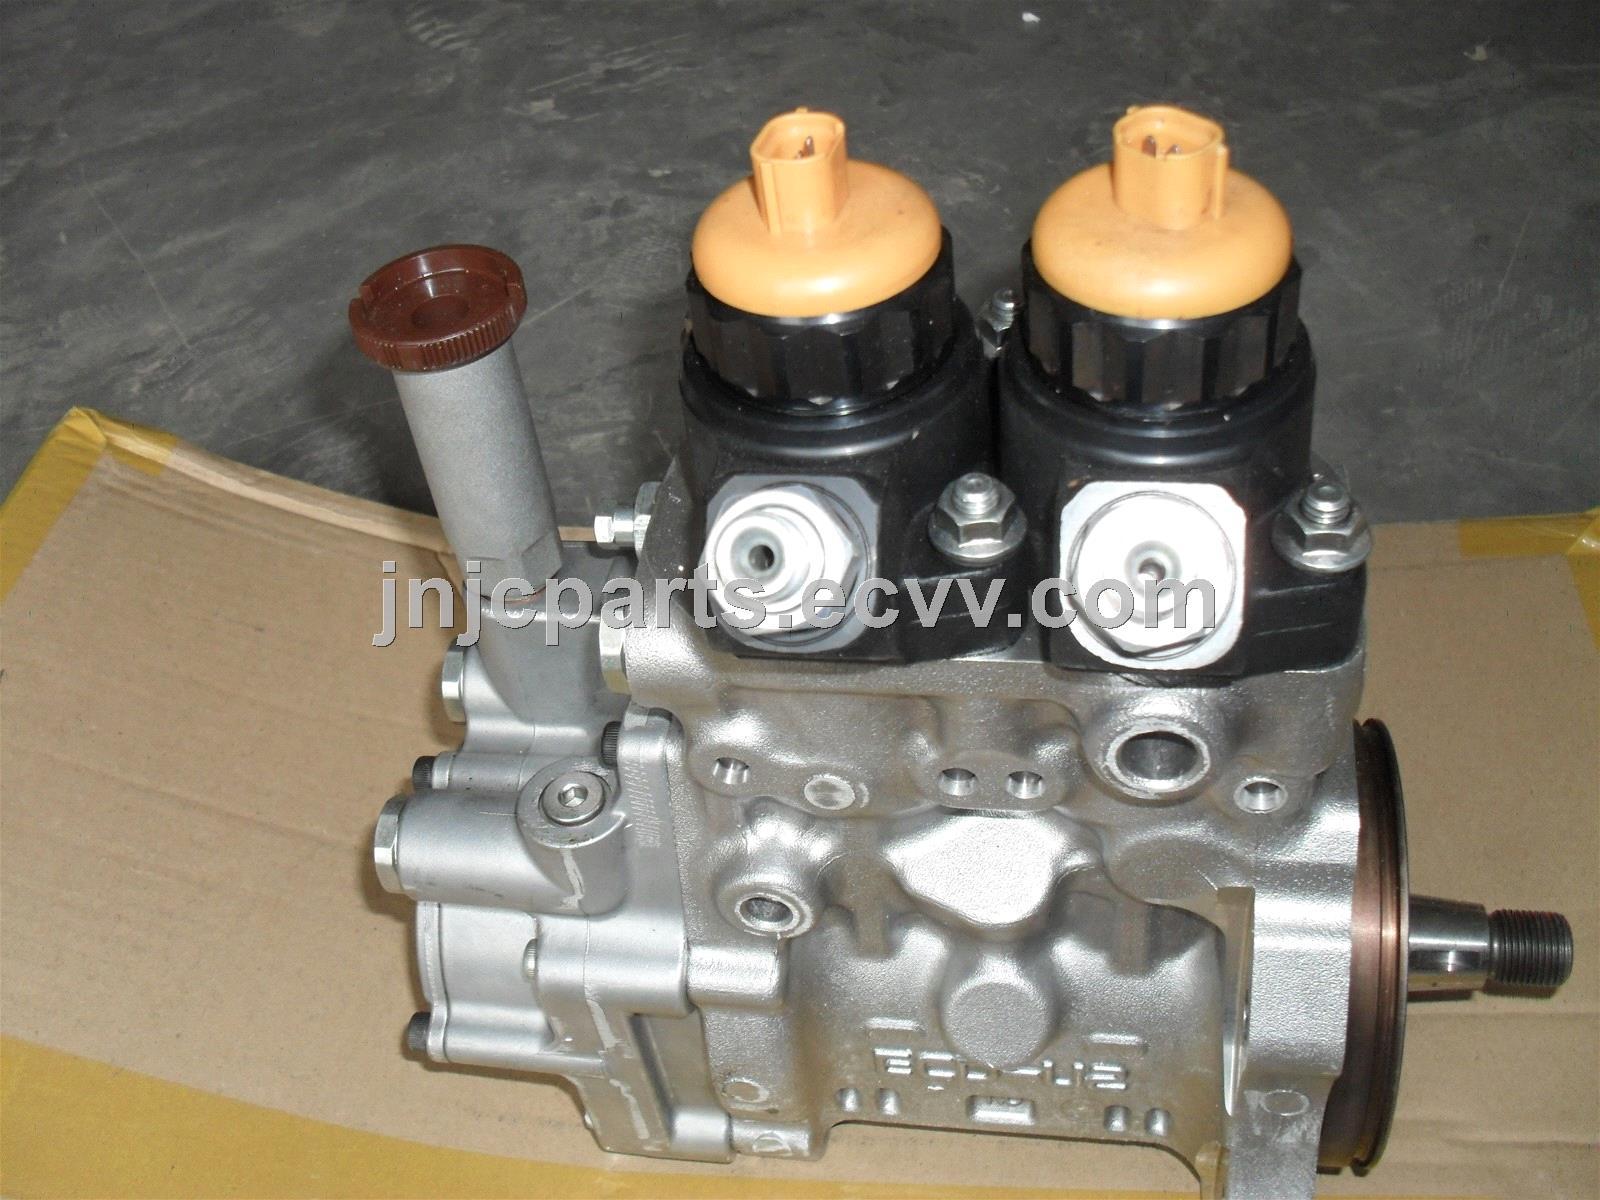 Yanmar diesel fuel pump fuel injector pump for diesel engine yanmar diesel fuel pump fuel injector pump for diesel engine yanmar fuel pump ccuart Image collections